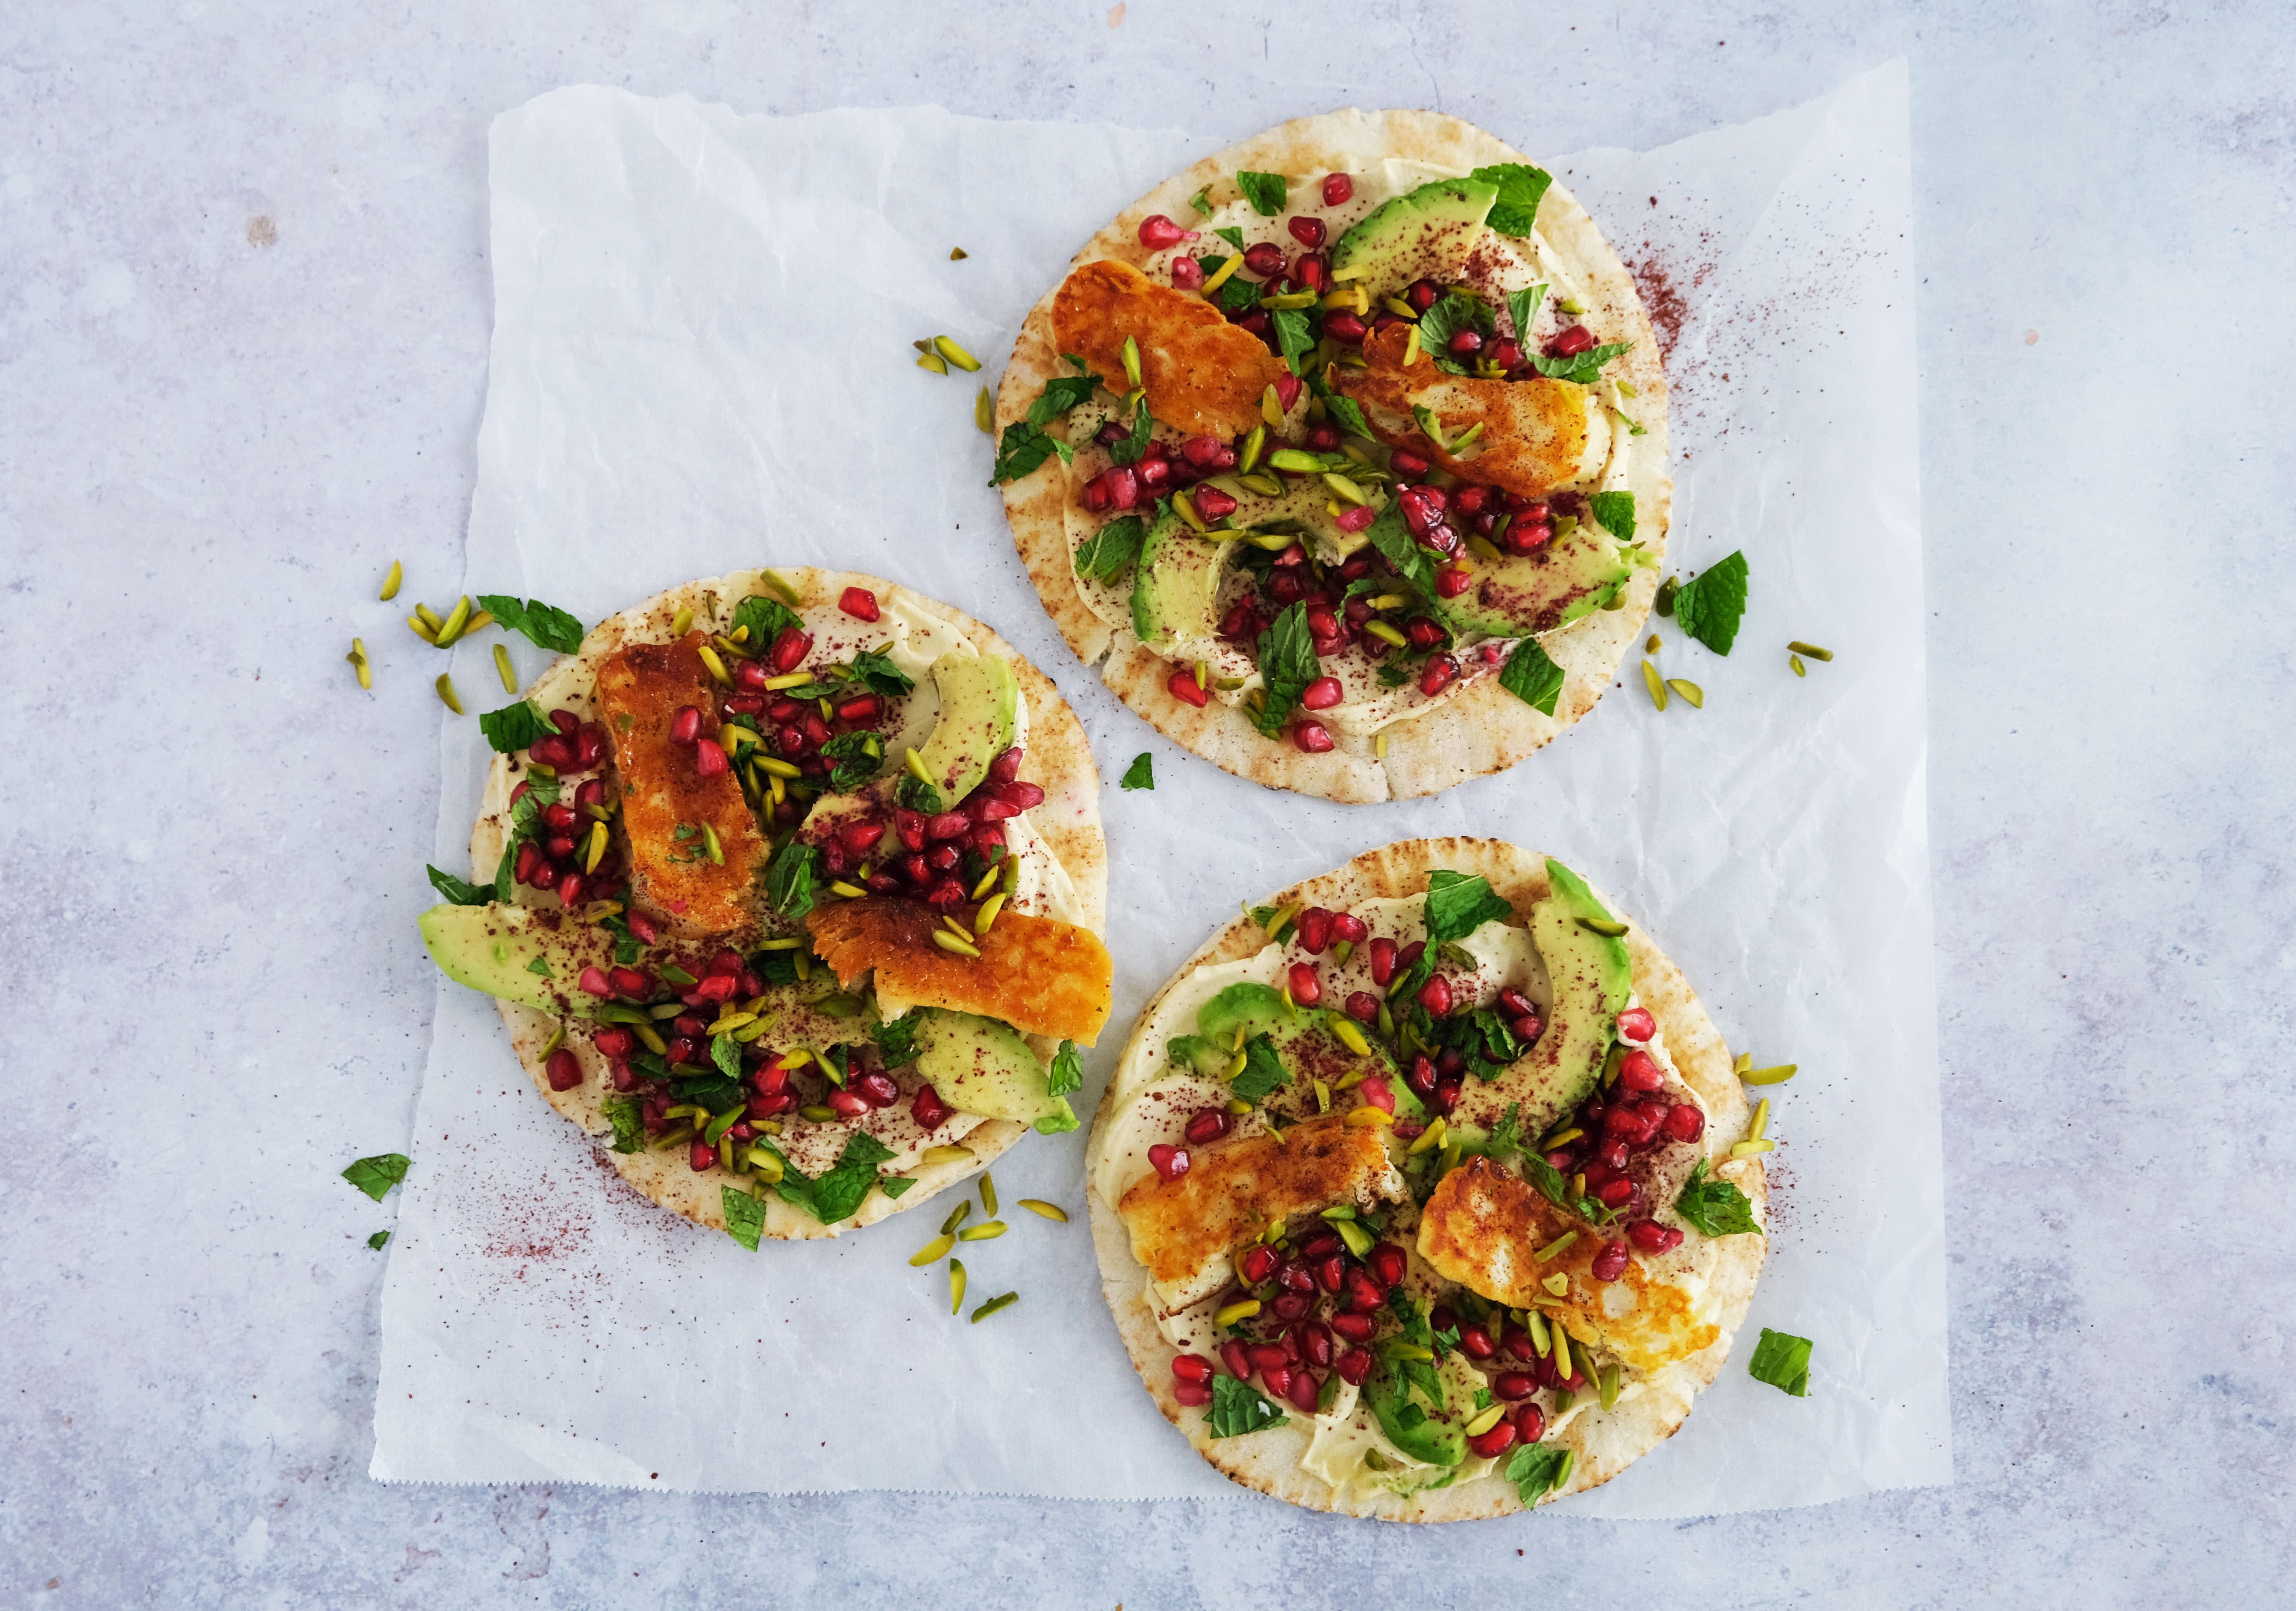 Honey Fried Halloumi Flatbreads with Hummus, Avocado and Pomegranate